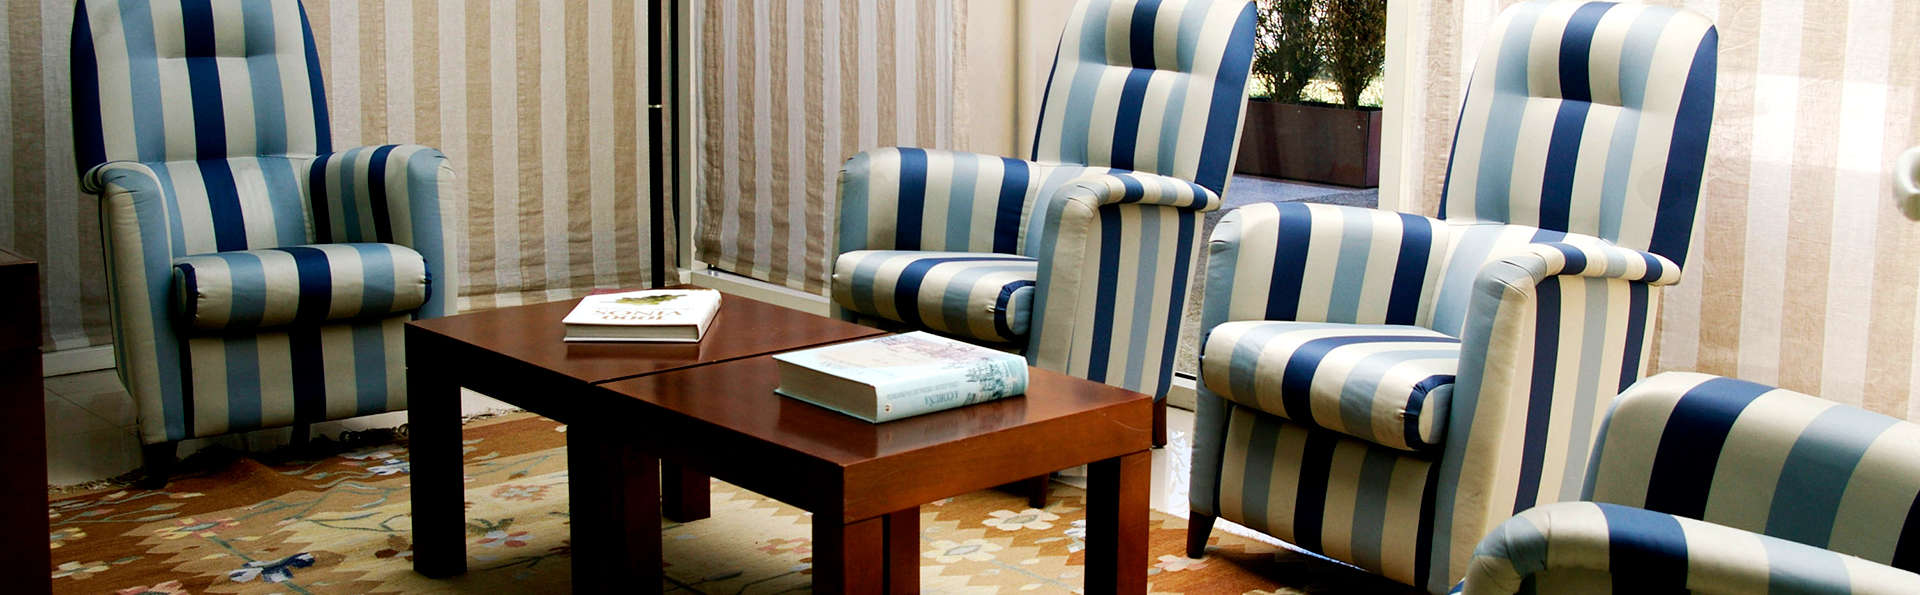 Hotel Villa de Betanzos - Edit_Lounge.jpg